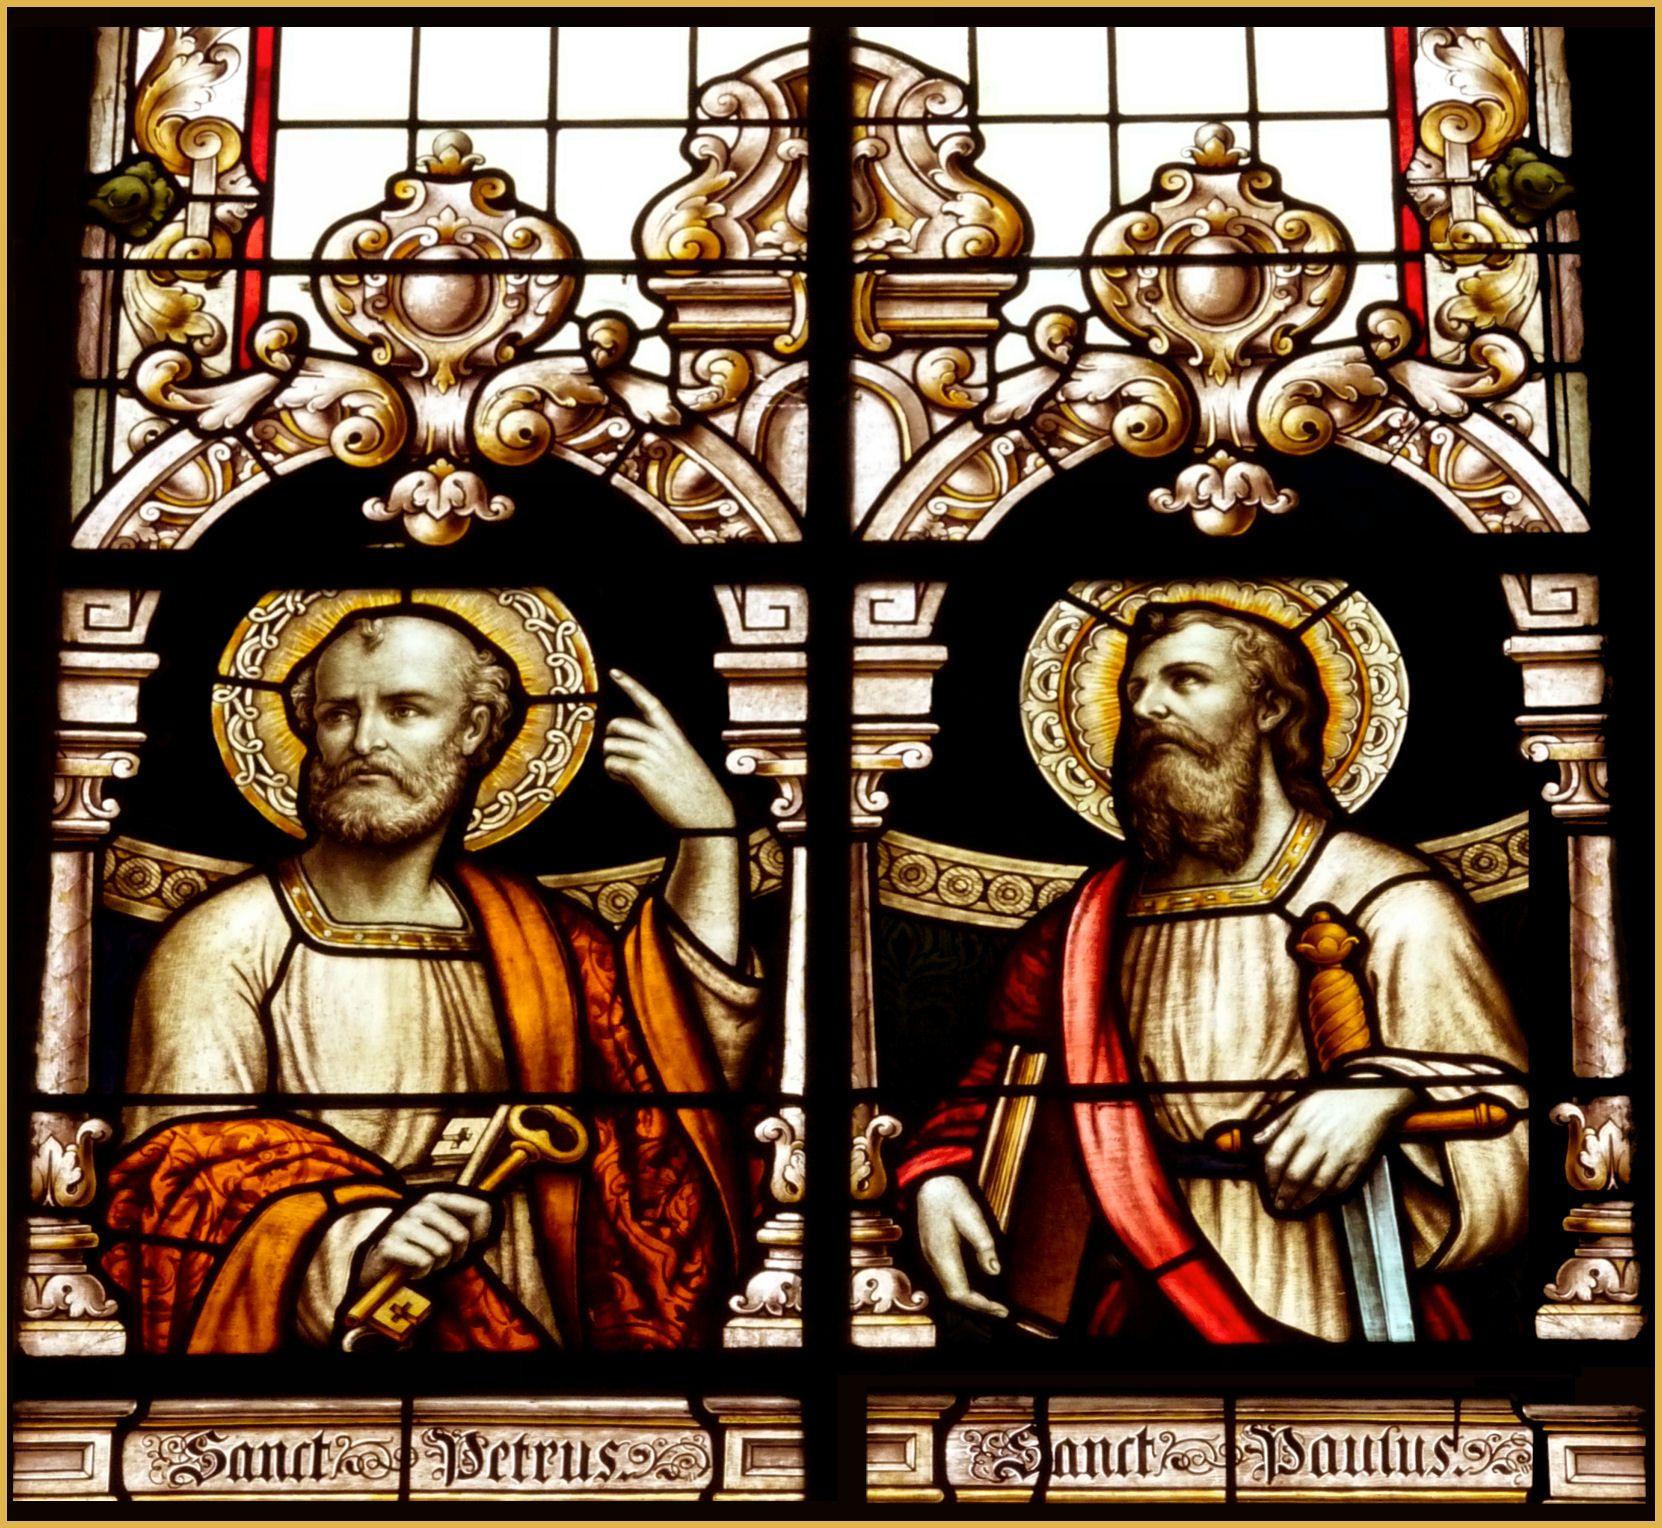 Saint Peter & Saint Paul Jun. 29 is a national holiday